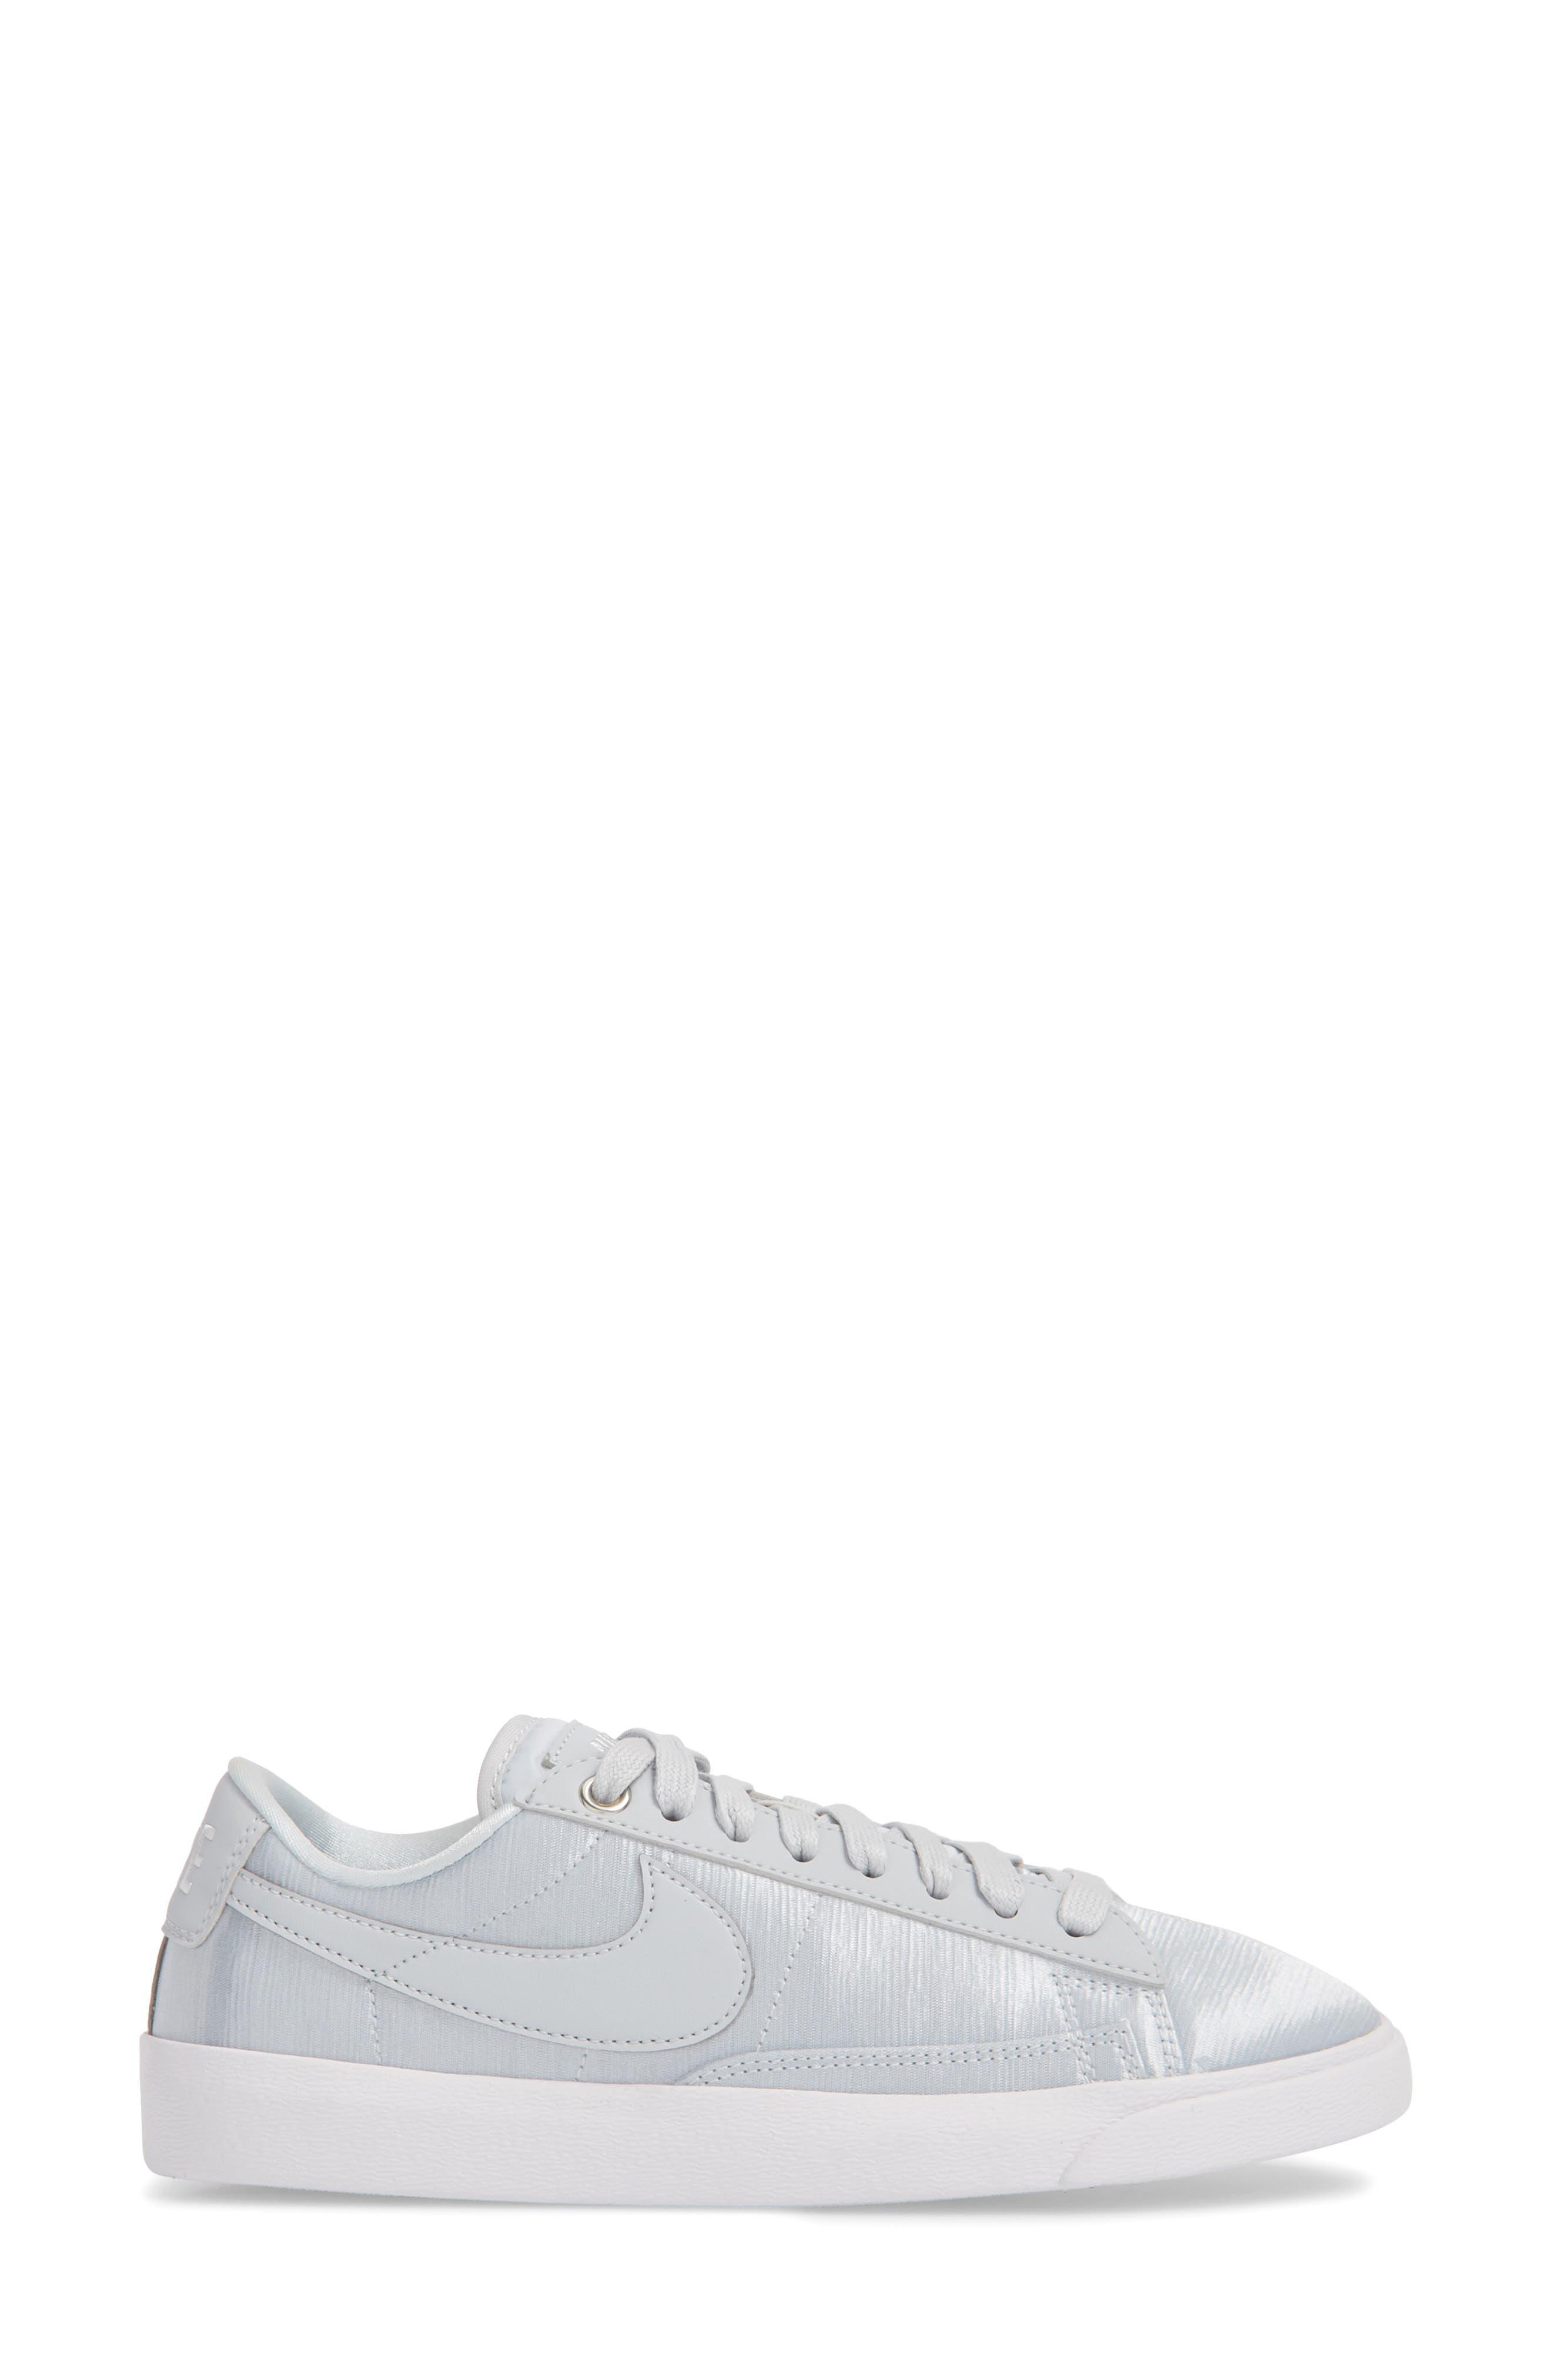 Blazer Low Top Sneaker SE,                             Alternate thumbnail 3, color,                             040